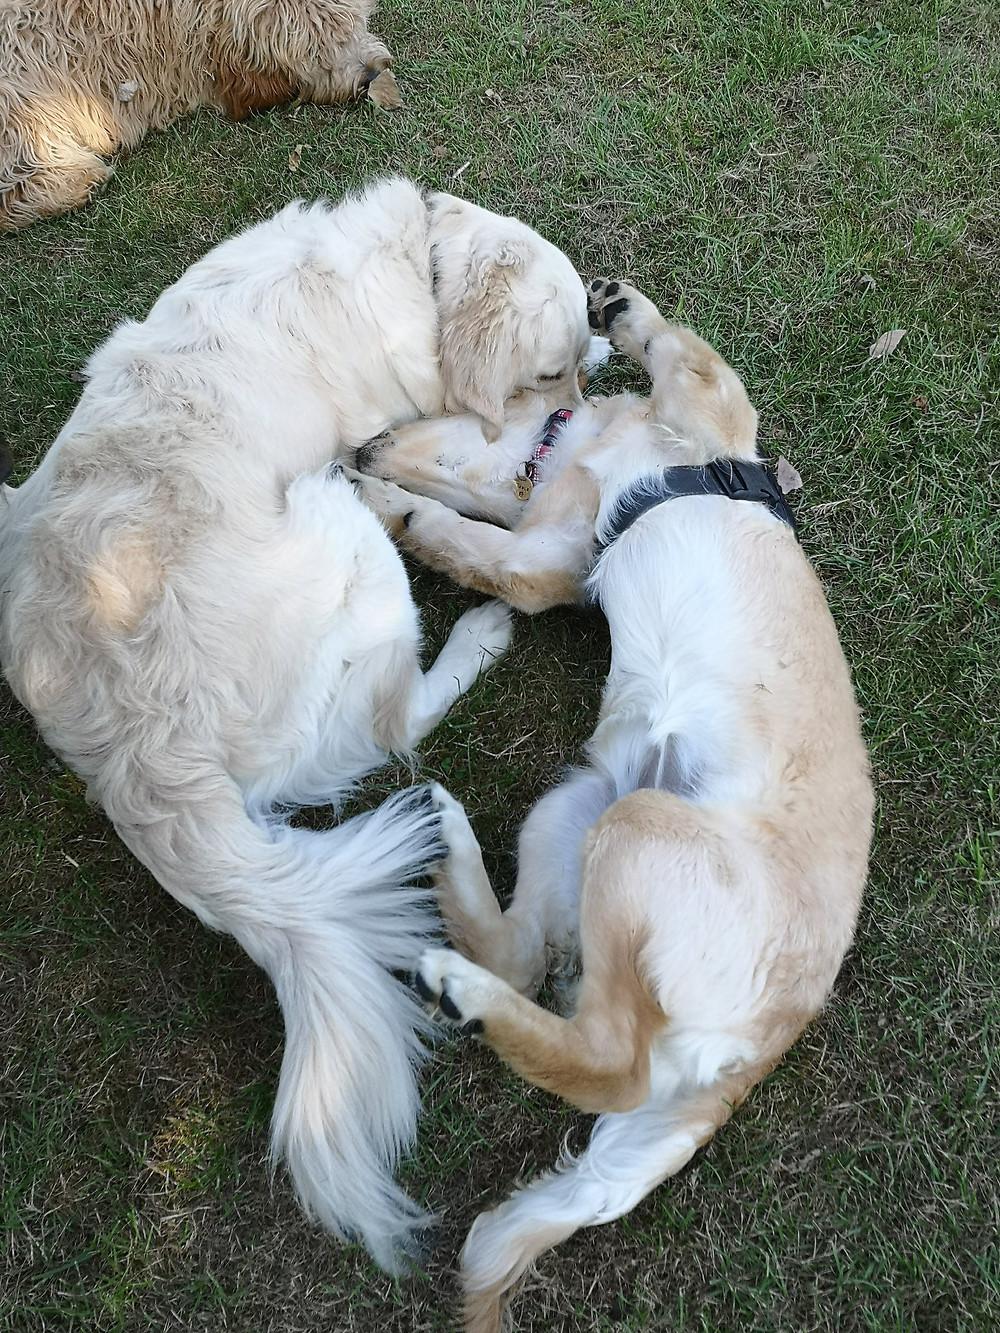 Good body language dogs playing